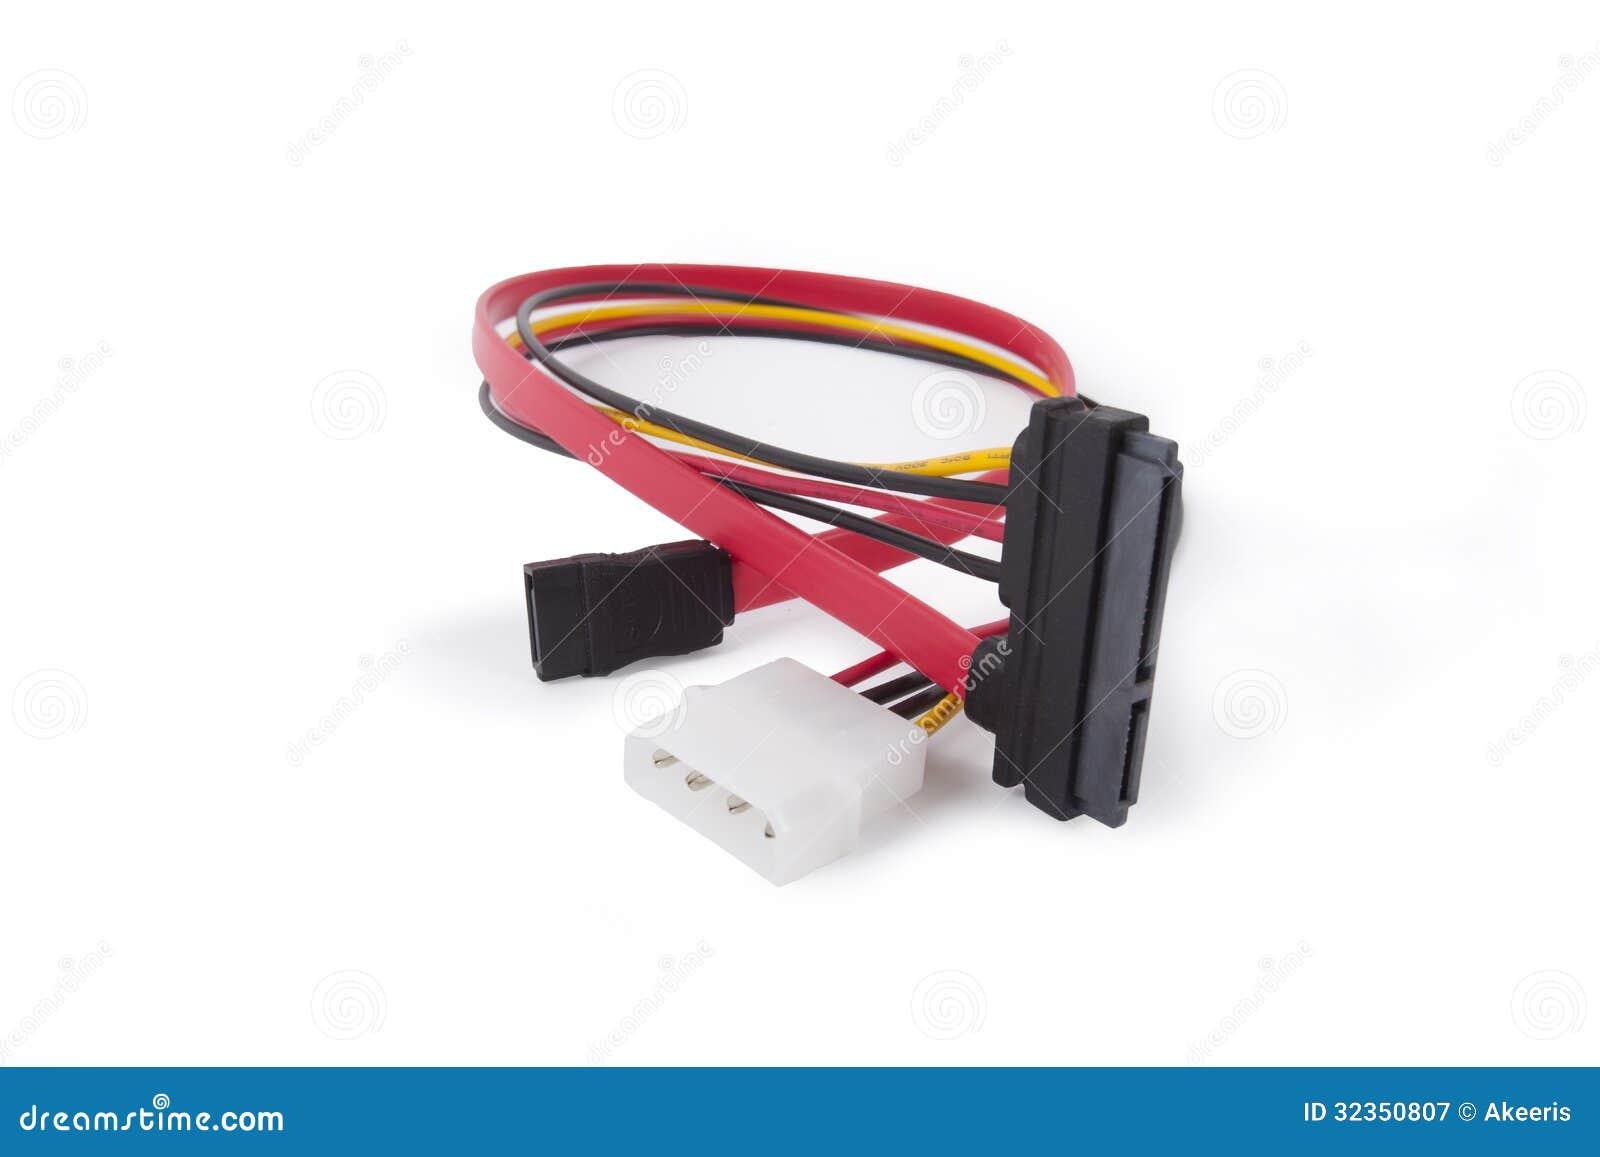 Computer plug stock image. Image of plug, electrical - 32350807